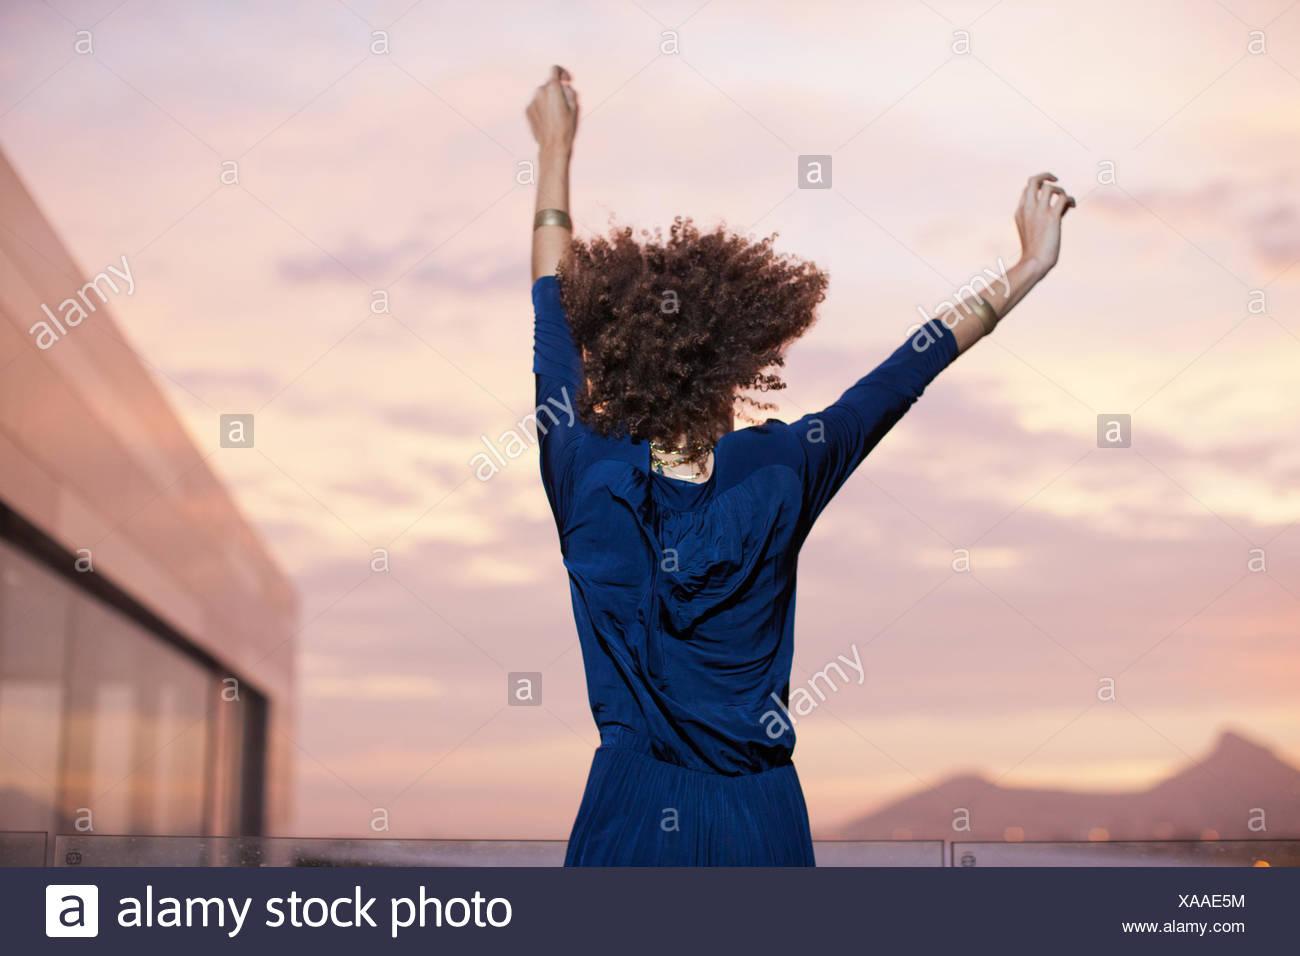 Frau tanzt mit erhobenen Armen Stockbild